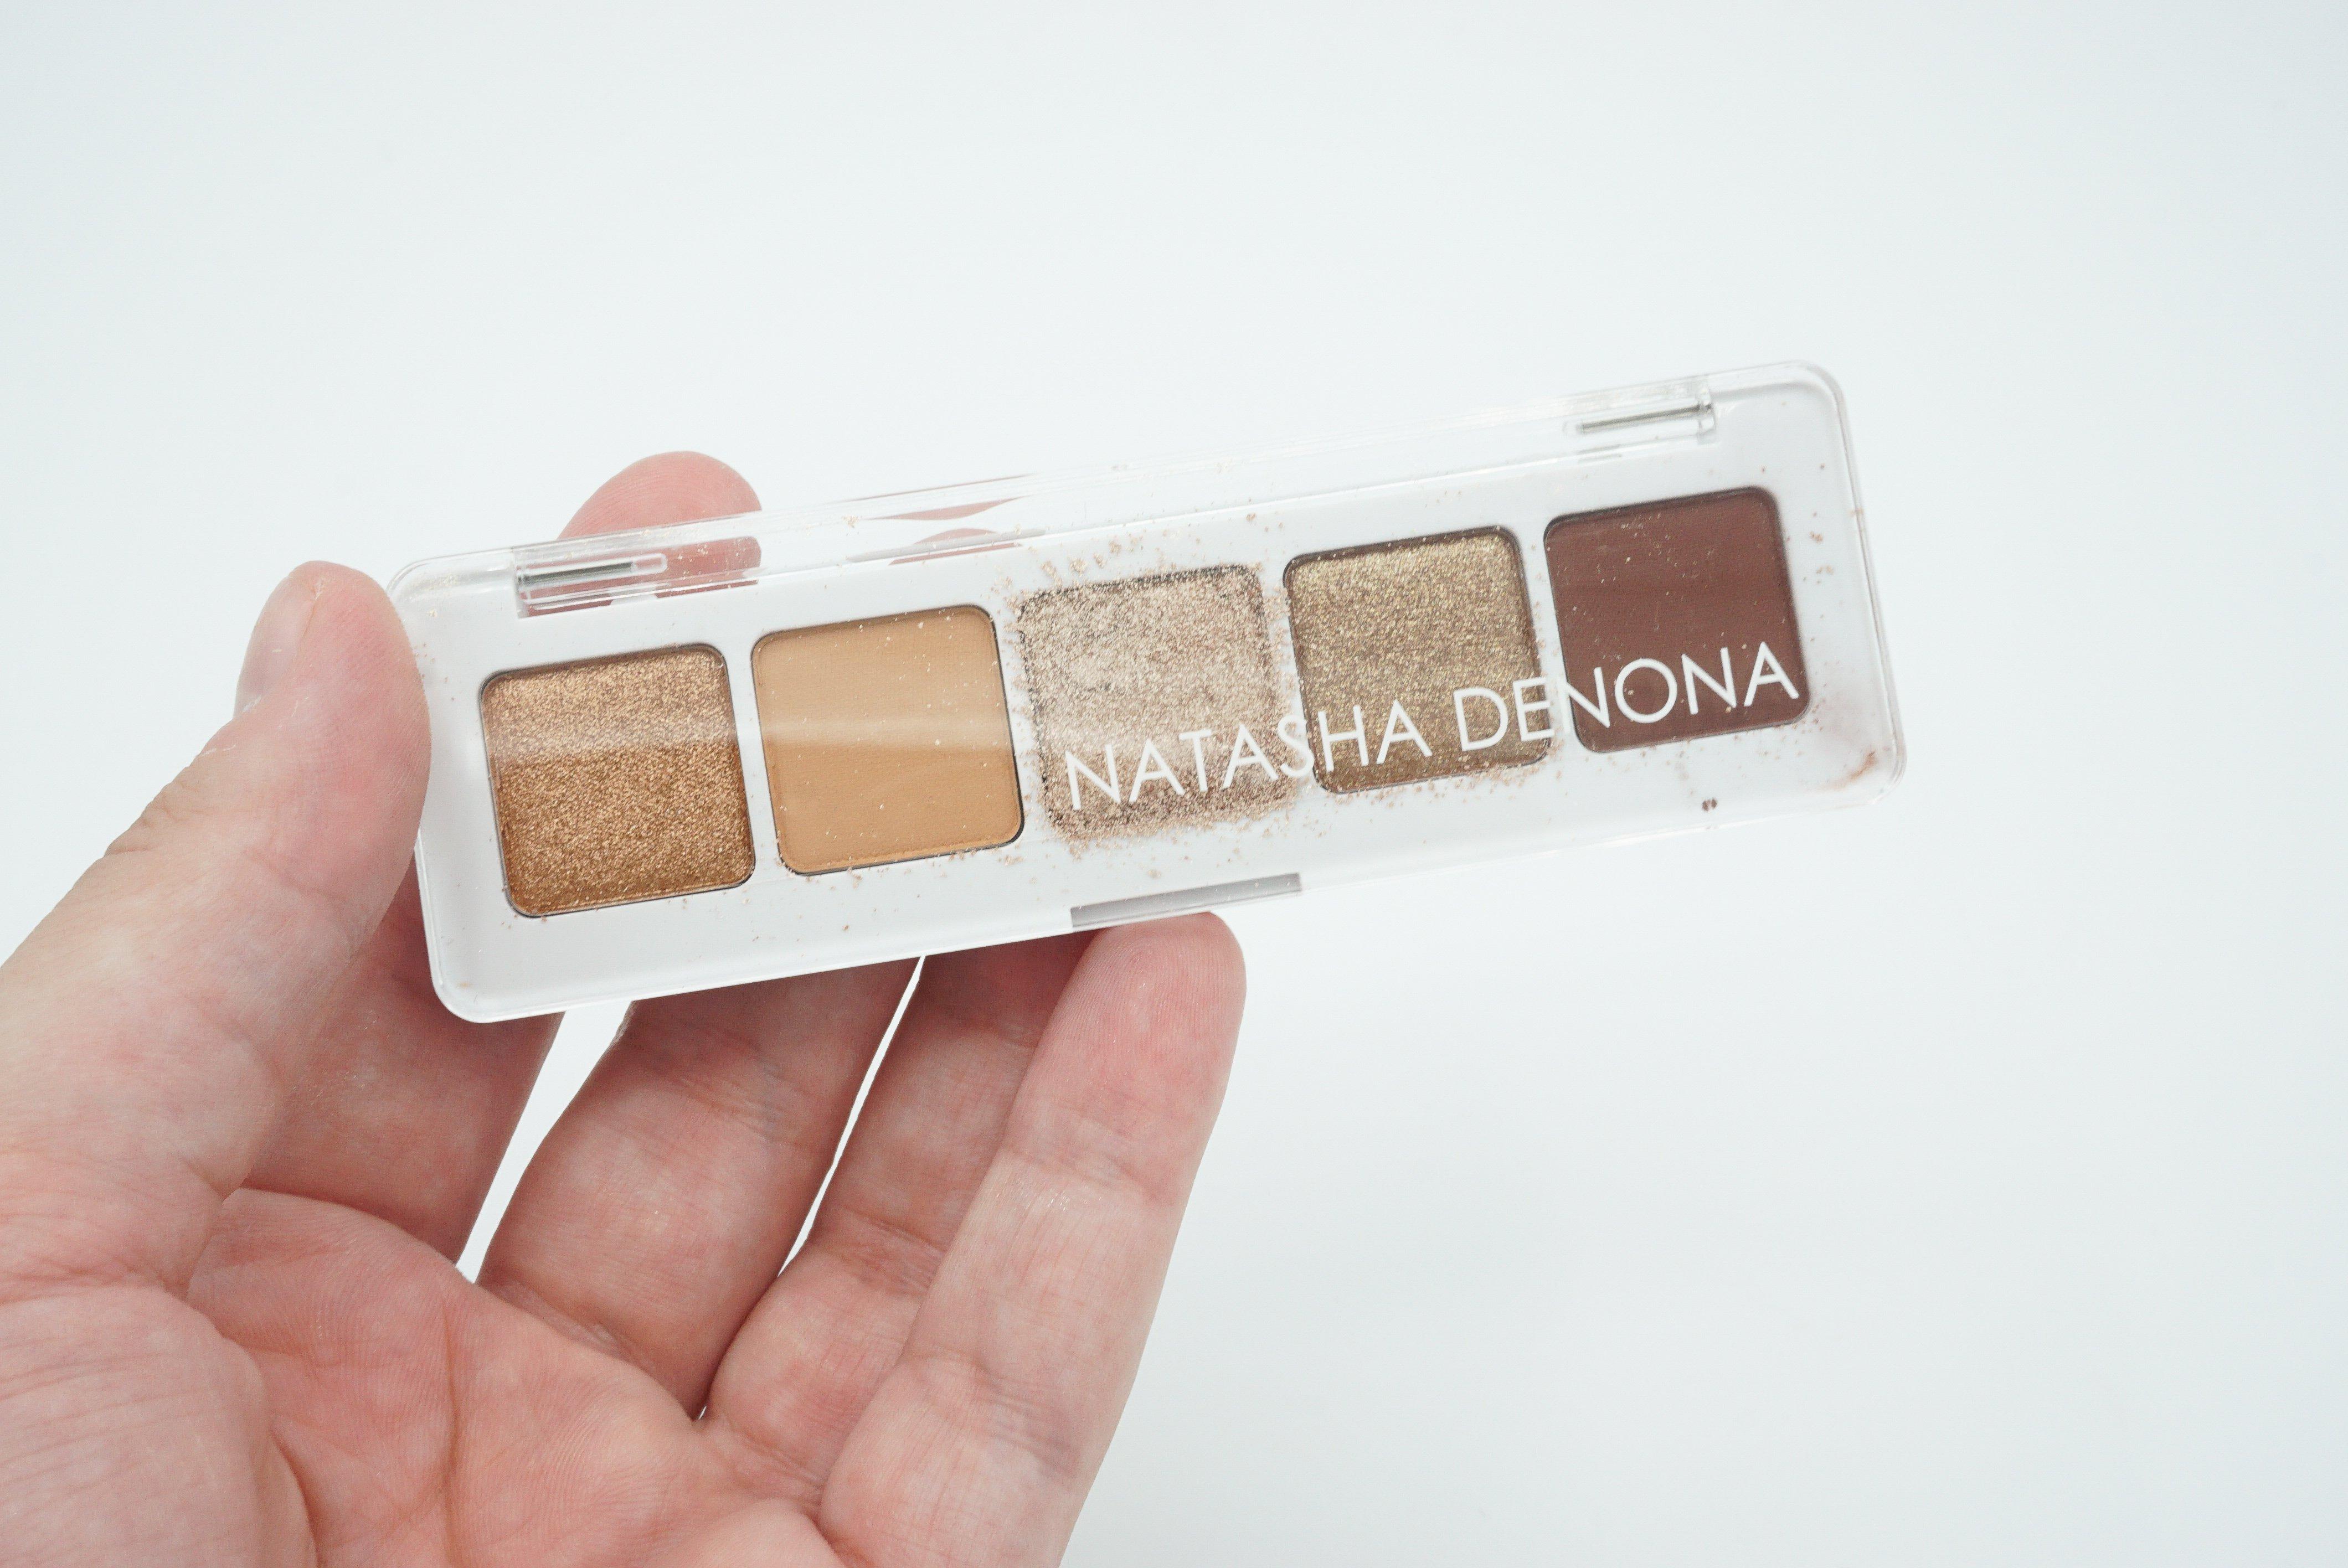 Huge Sephora Haul | Natasha Denona Mini Nude palette